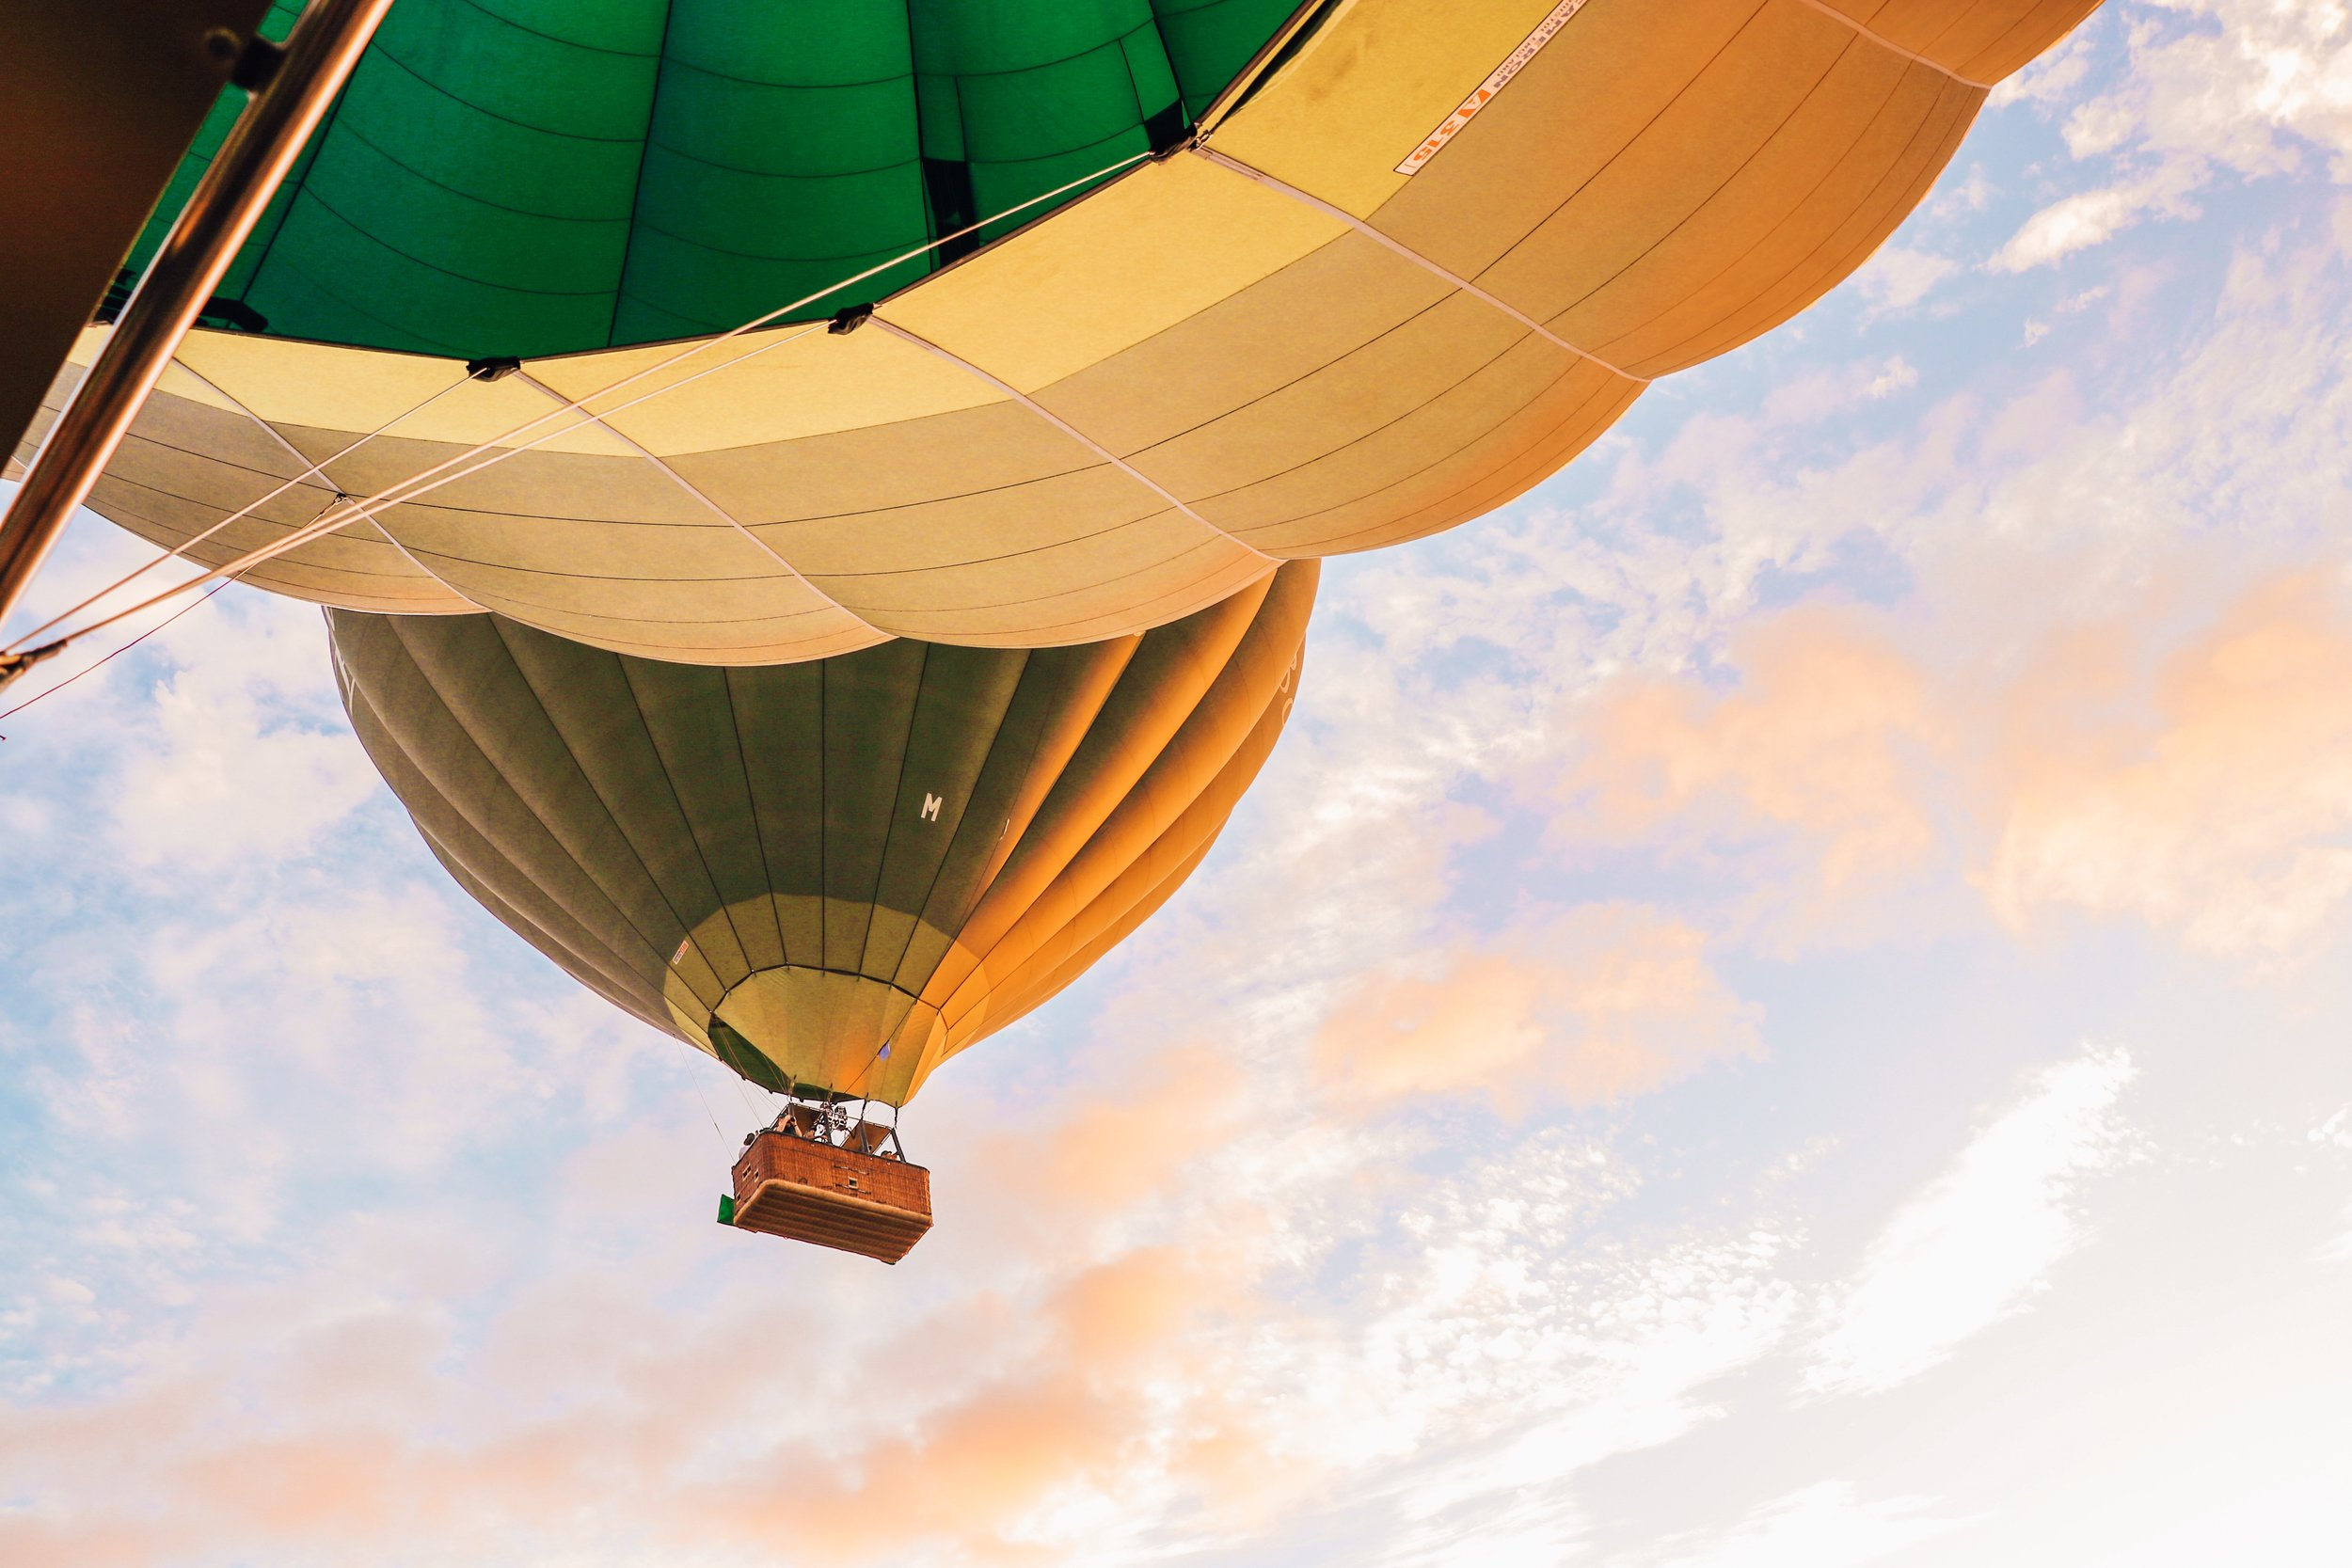 Up, up and away - Bagan, Myanmar